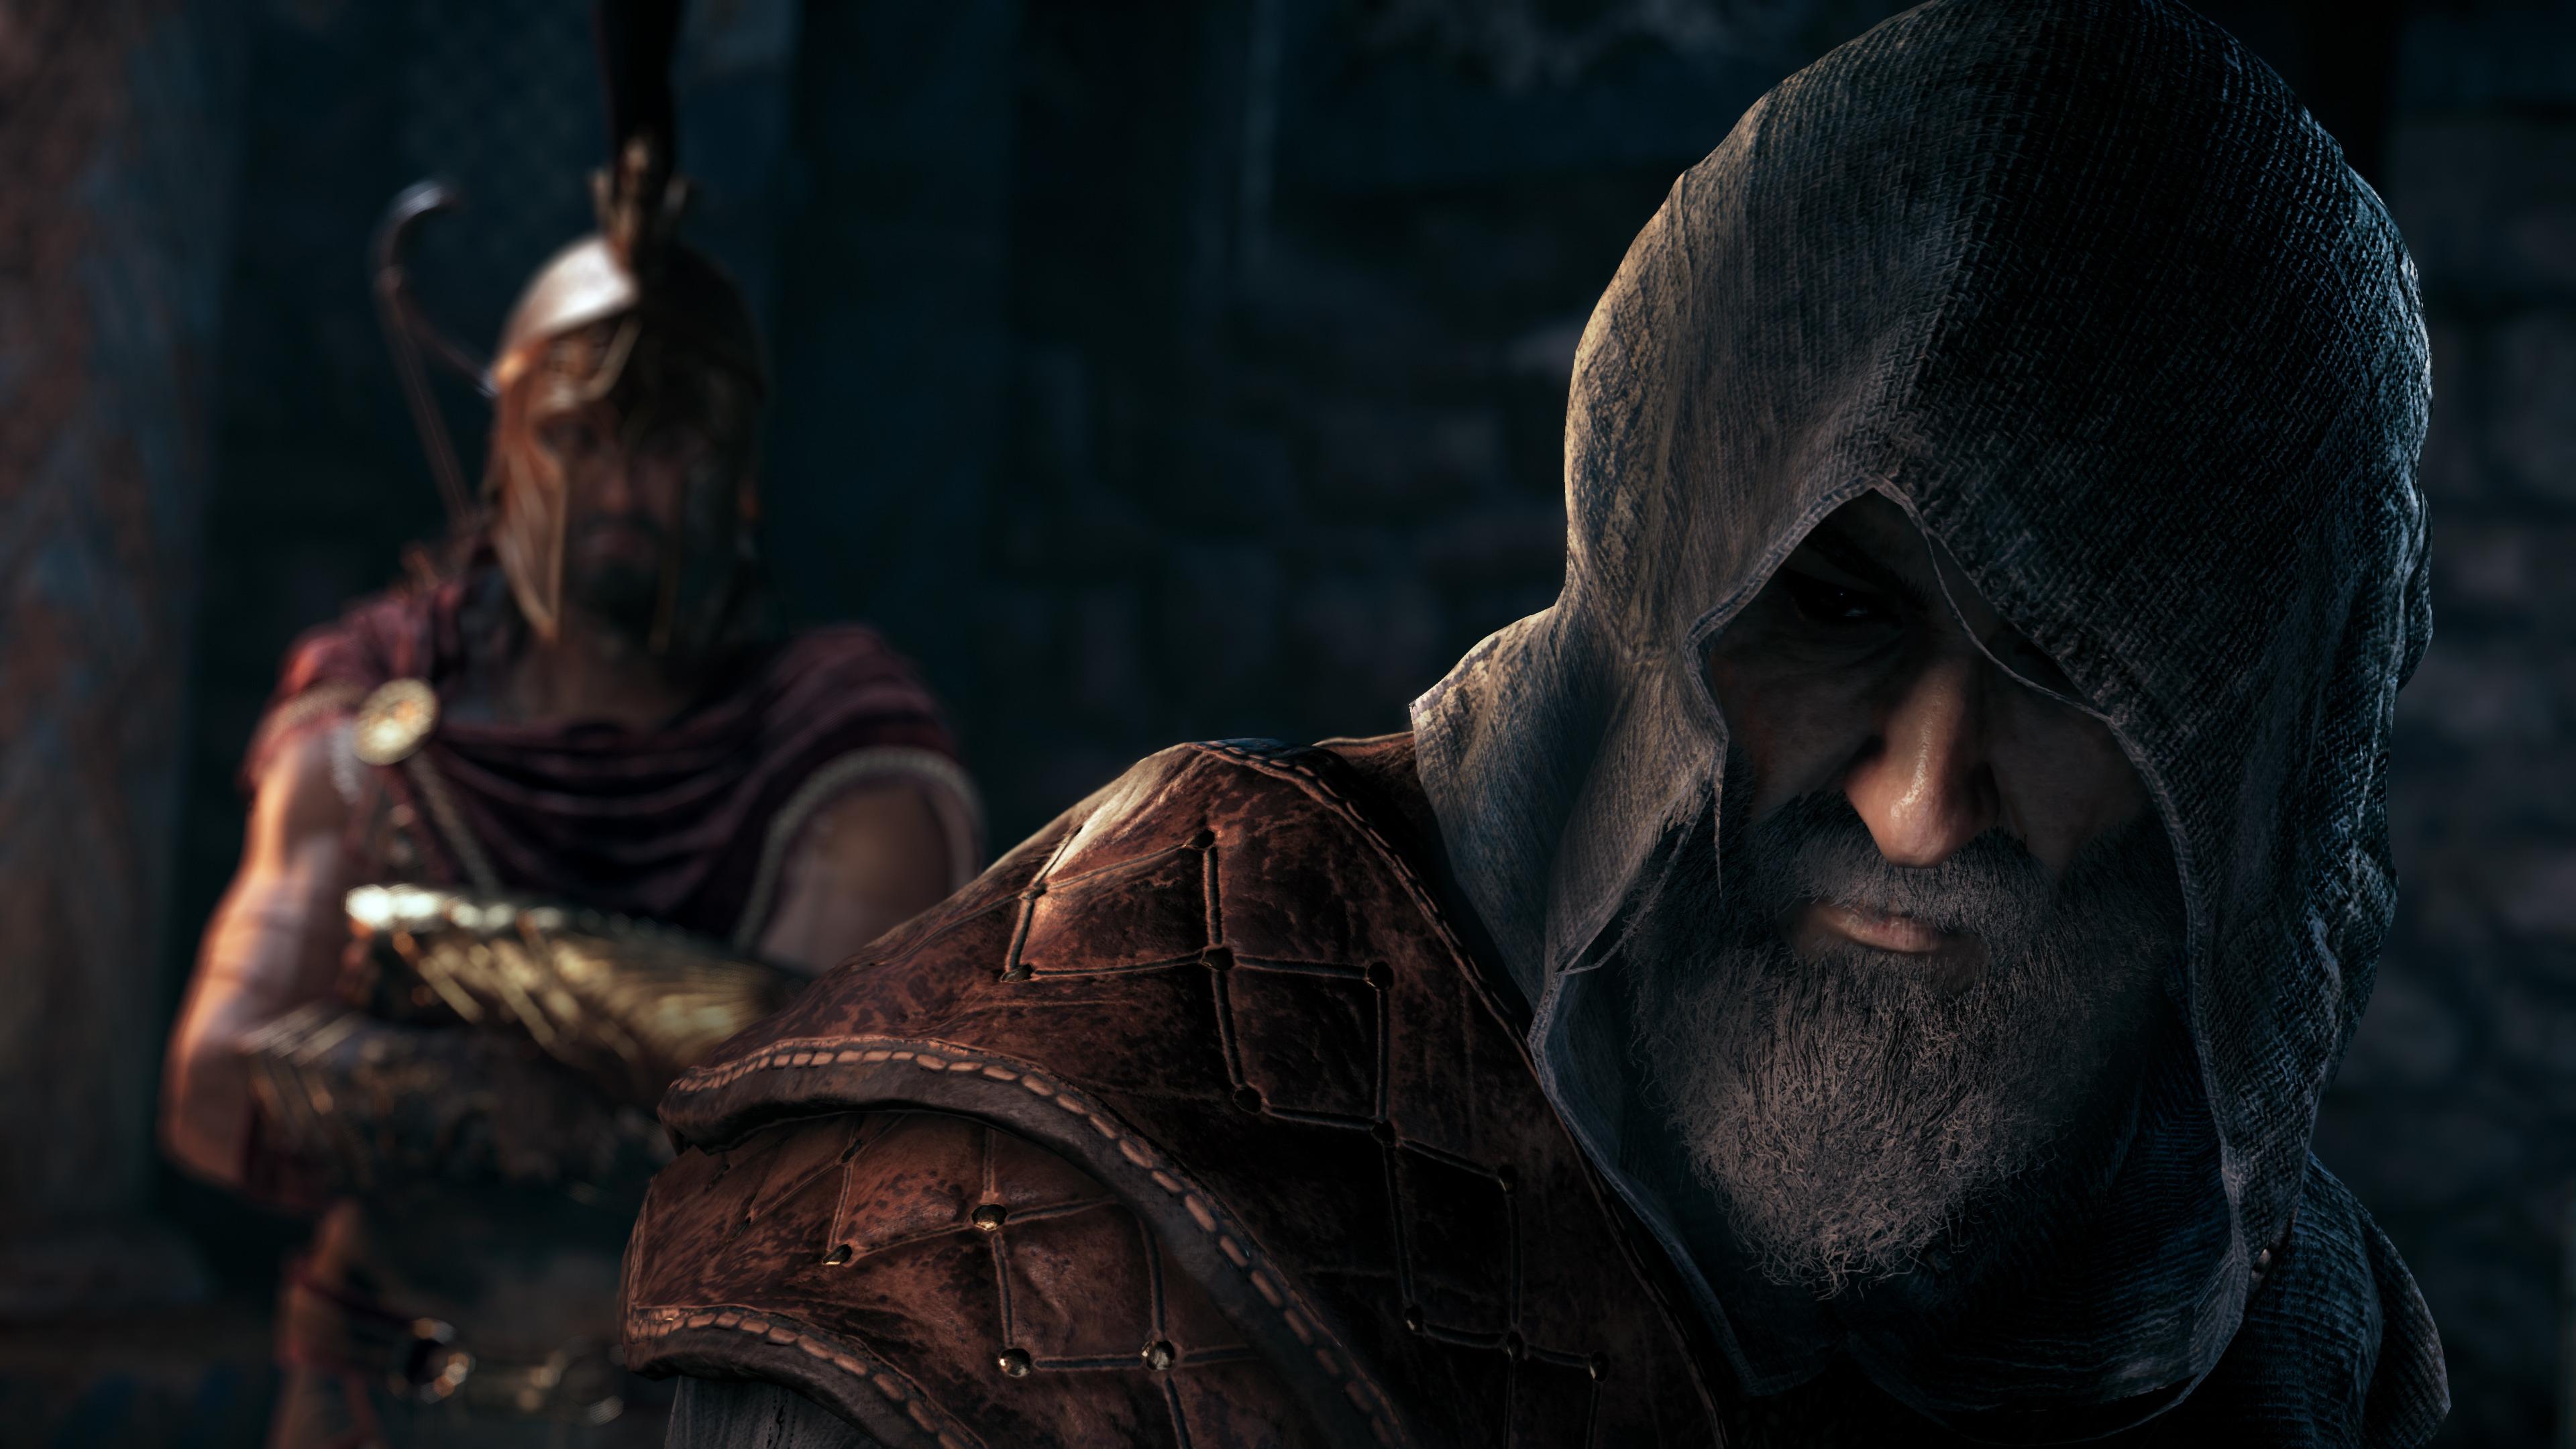 Wallpaper 4k Assassins Creed Odyssey 2018 4k New 2018 Games